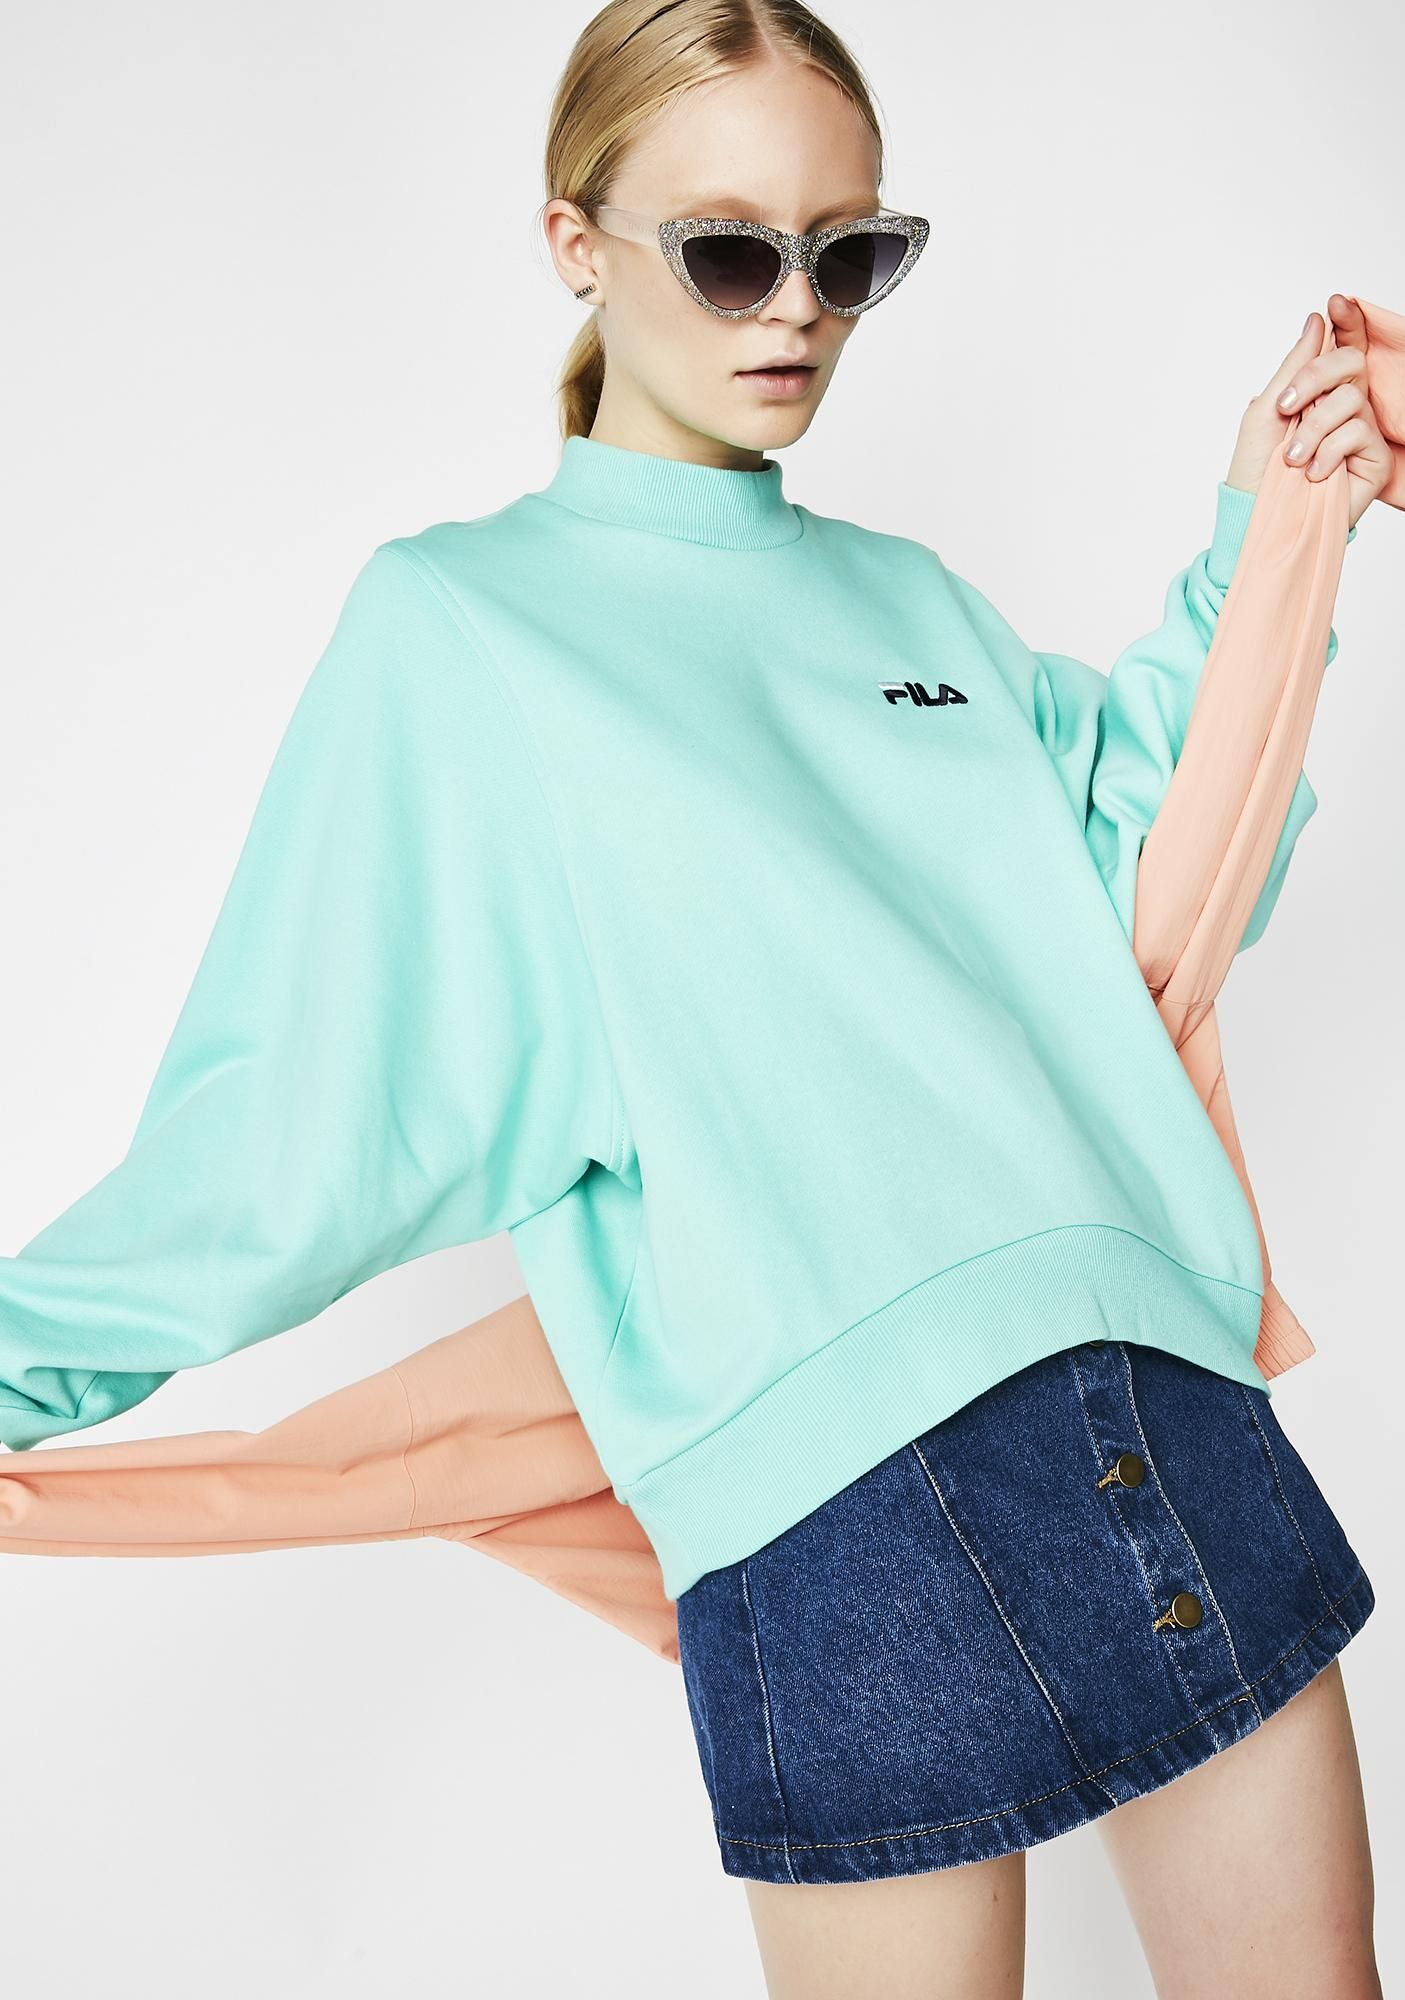 04294c519db Fila Summer Sweatshirt